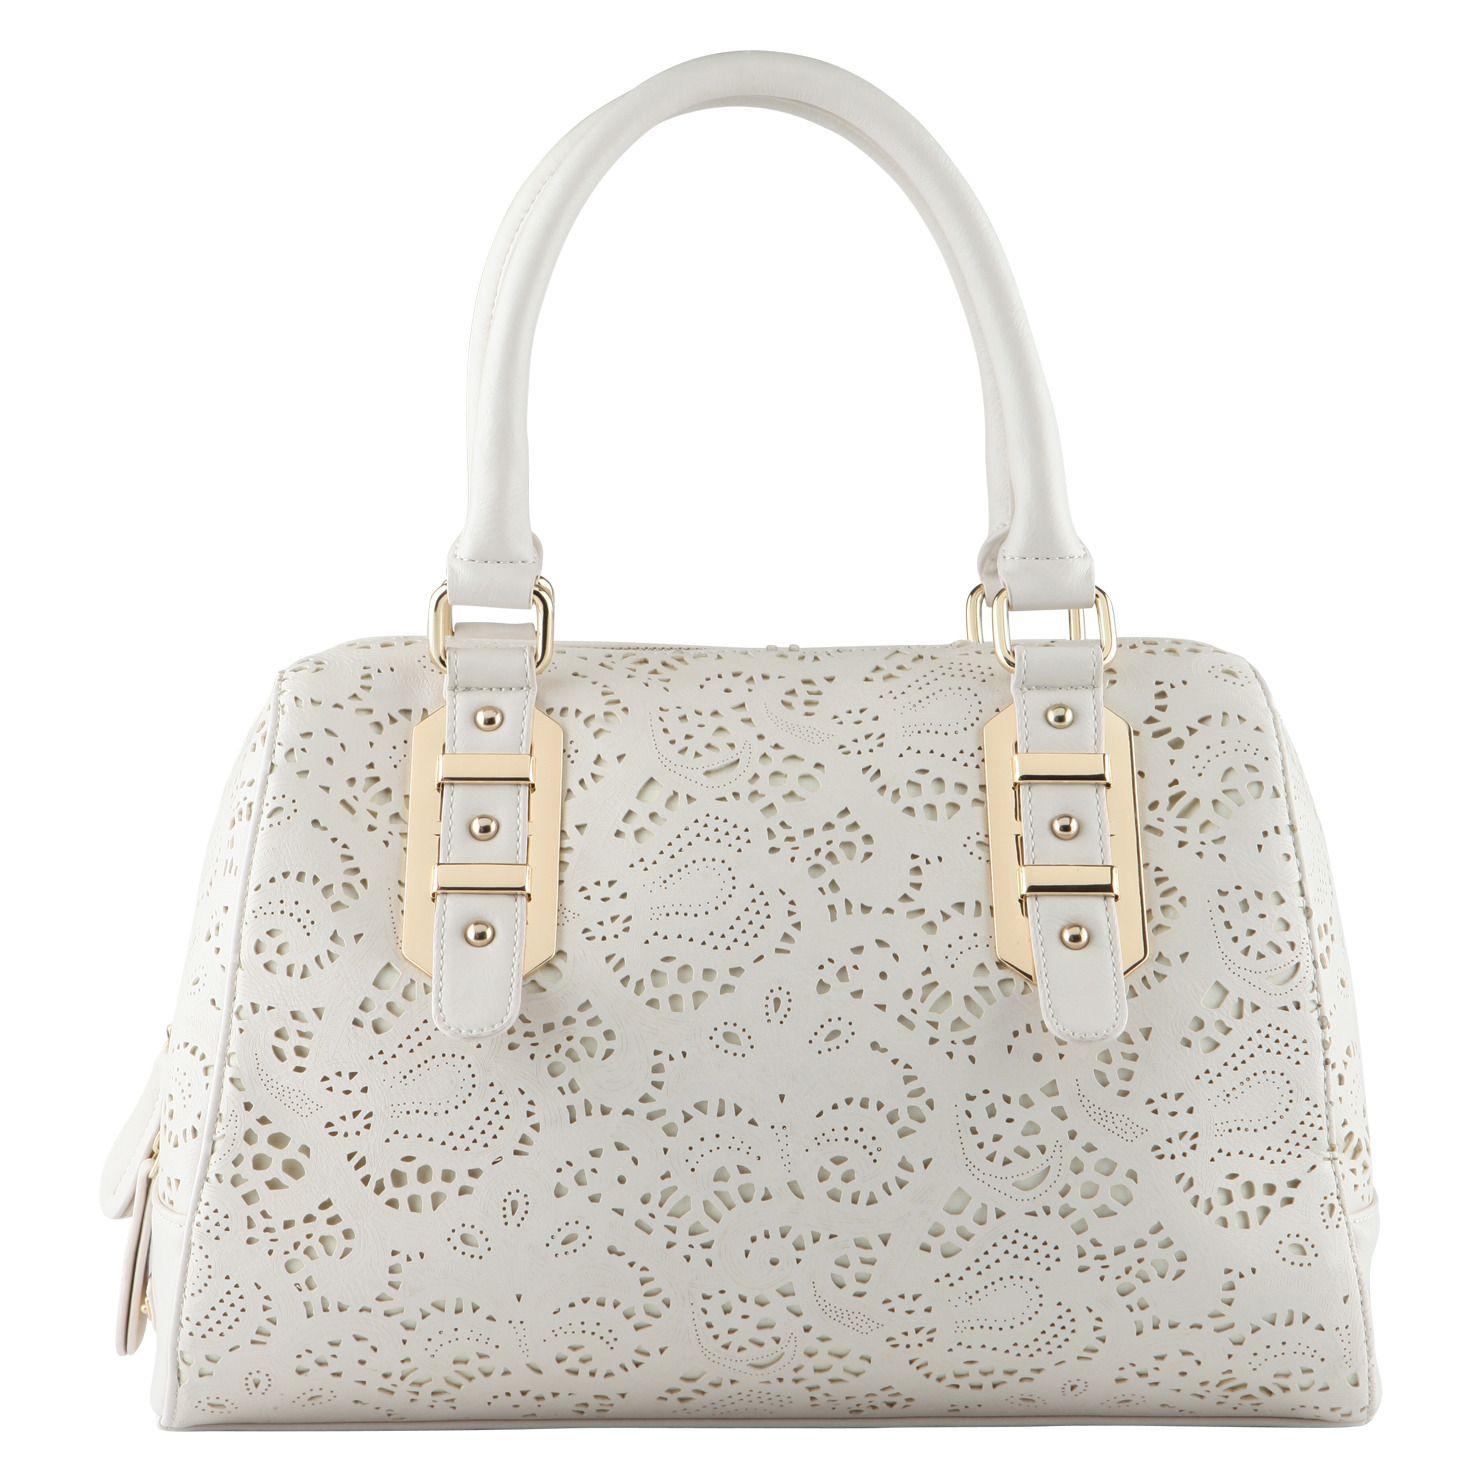 SMOLDT - handbags's satchels & handheld bags for sale at ALDO ...